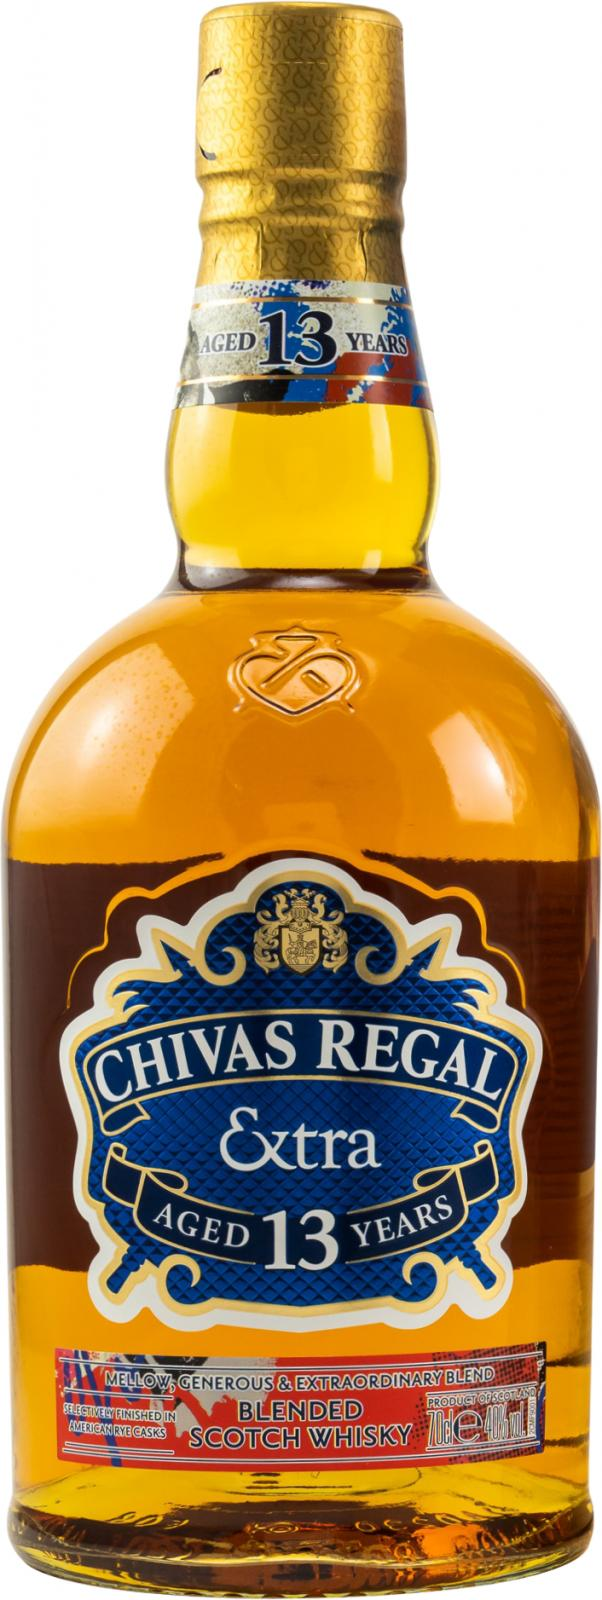 Chivas Regal 13-year-old - Extra